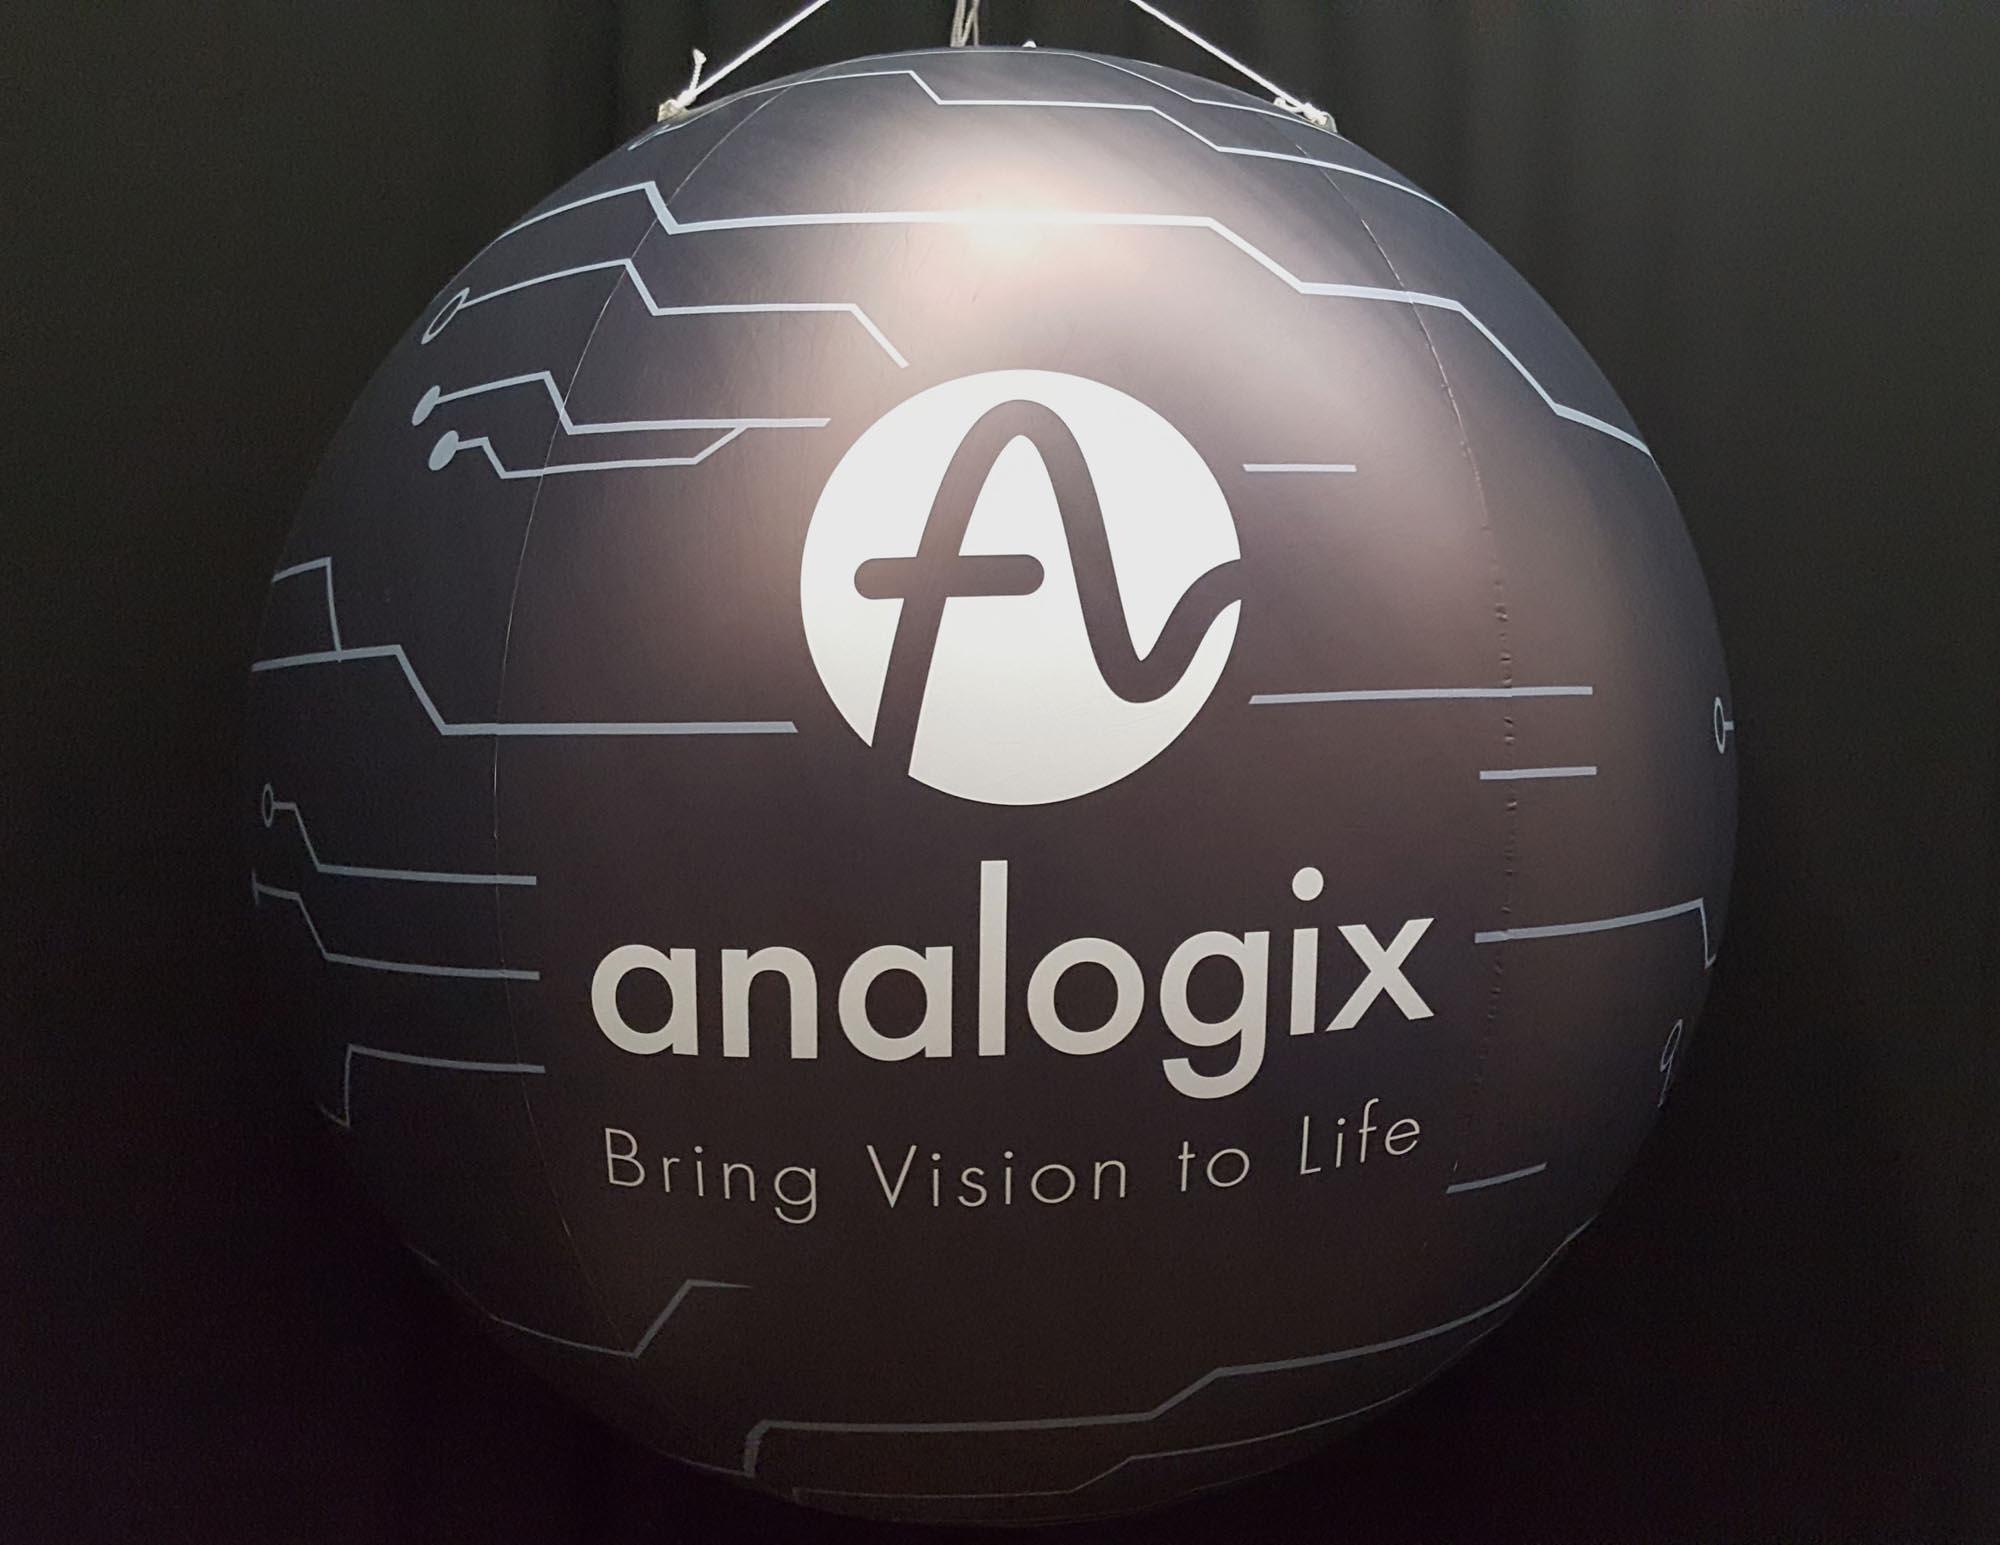 Analogix-PVC-Sphere--uai-2880x2225.jpg